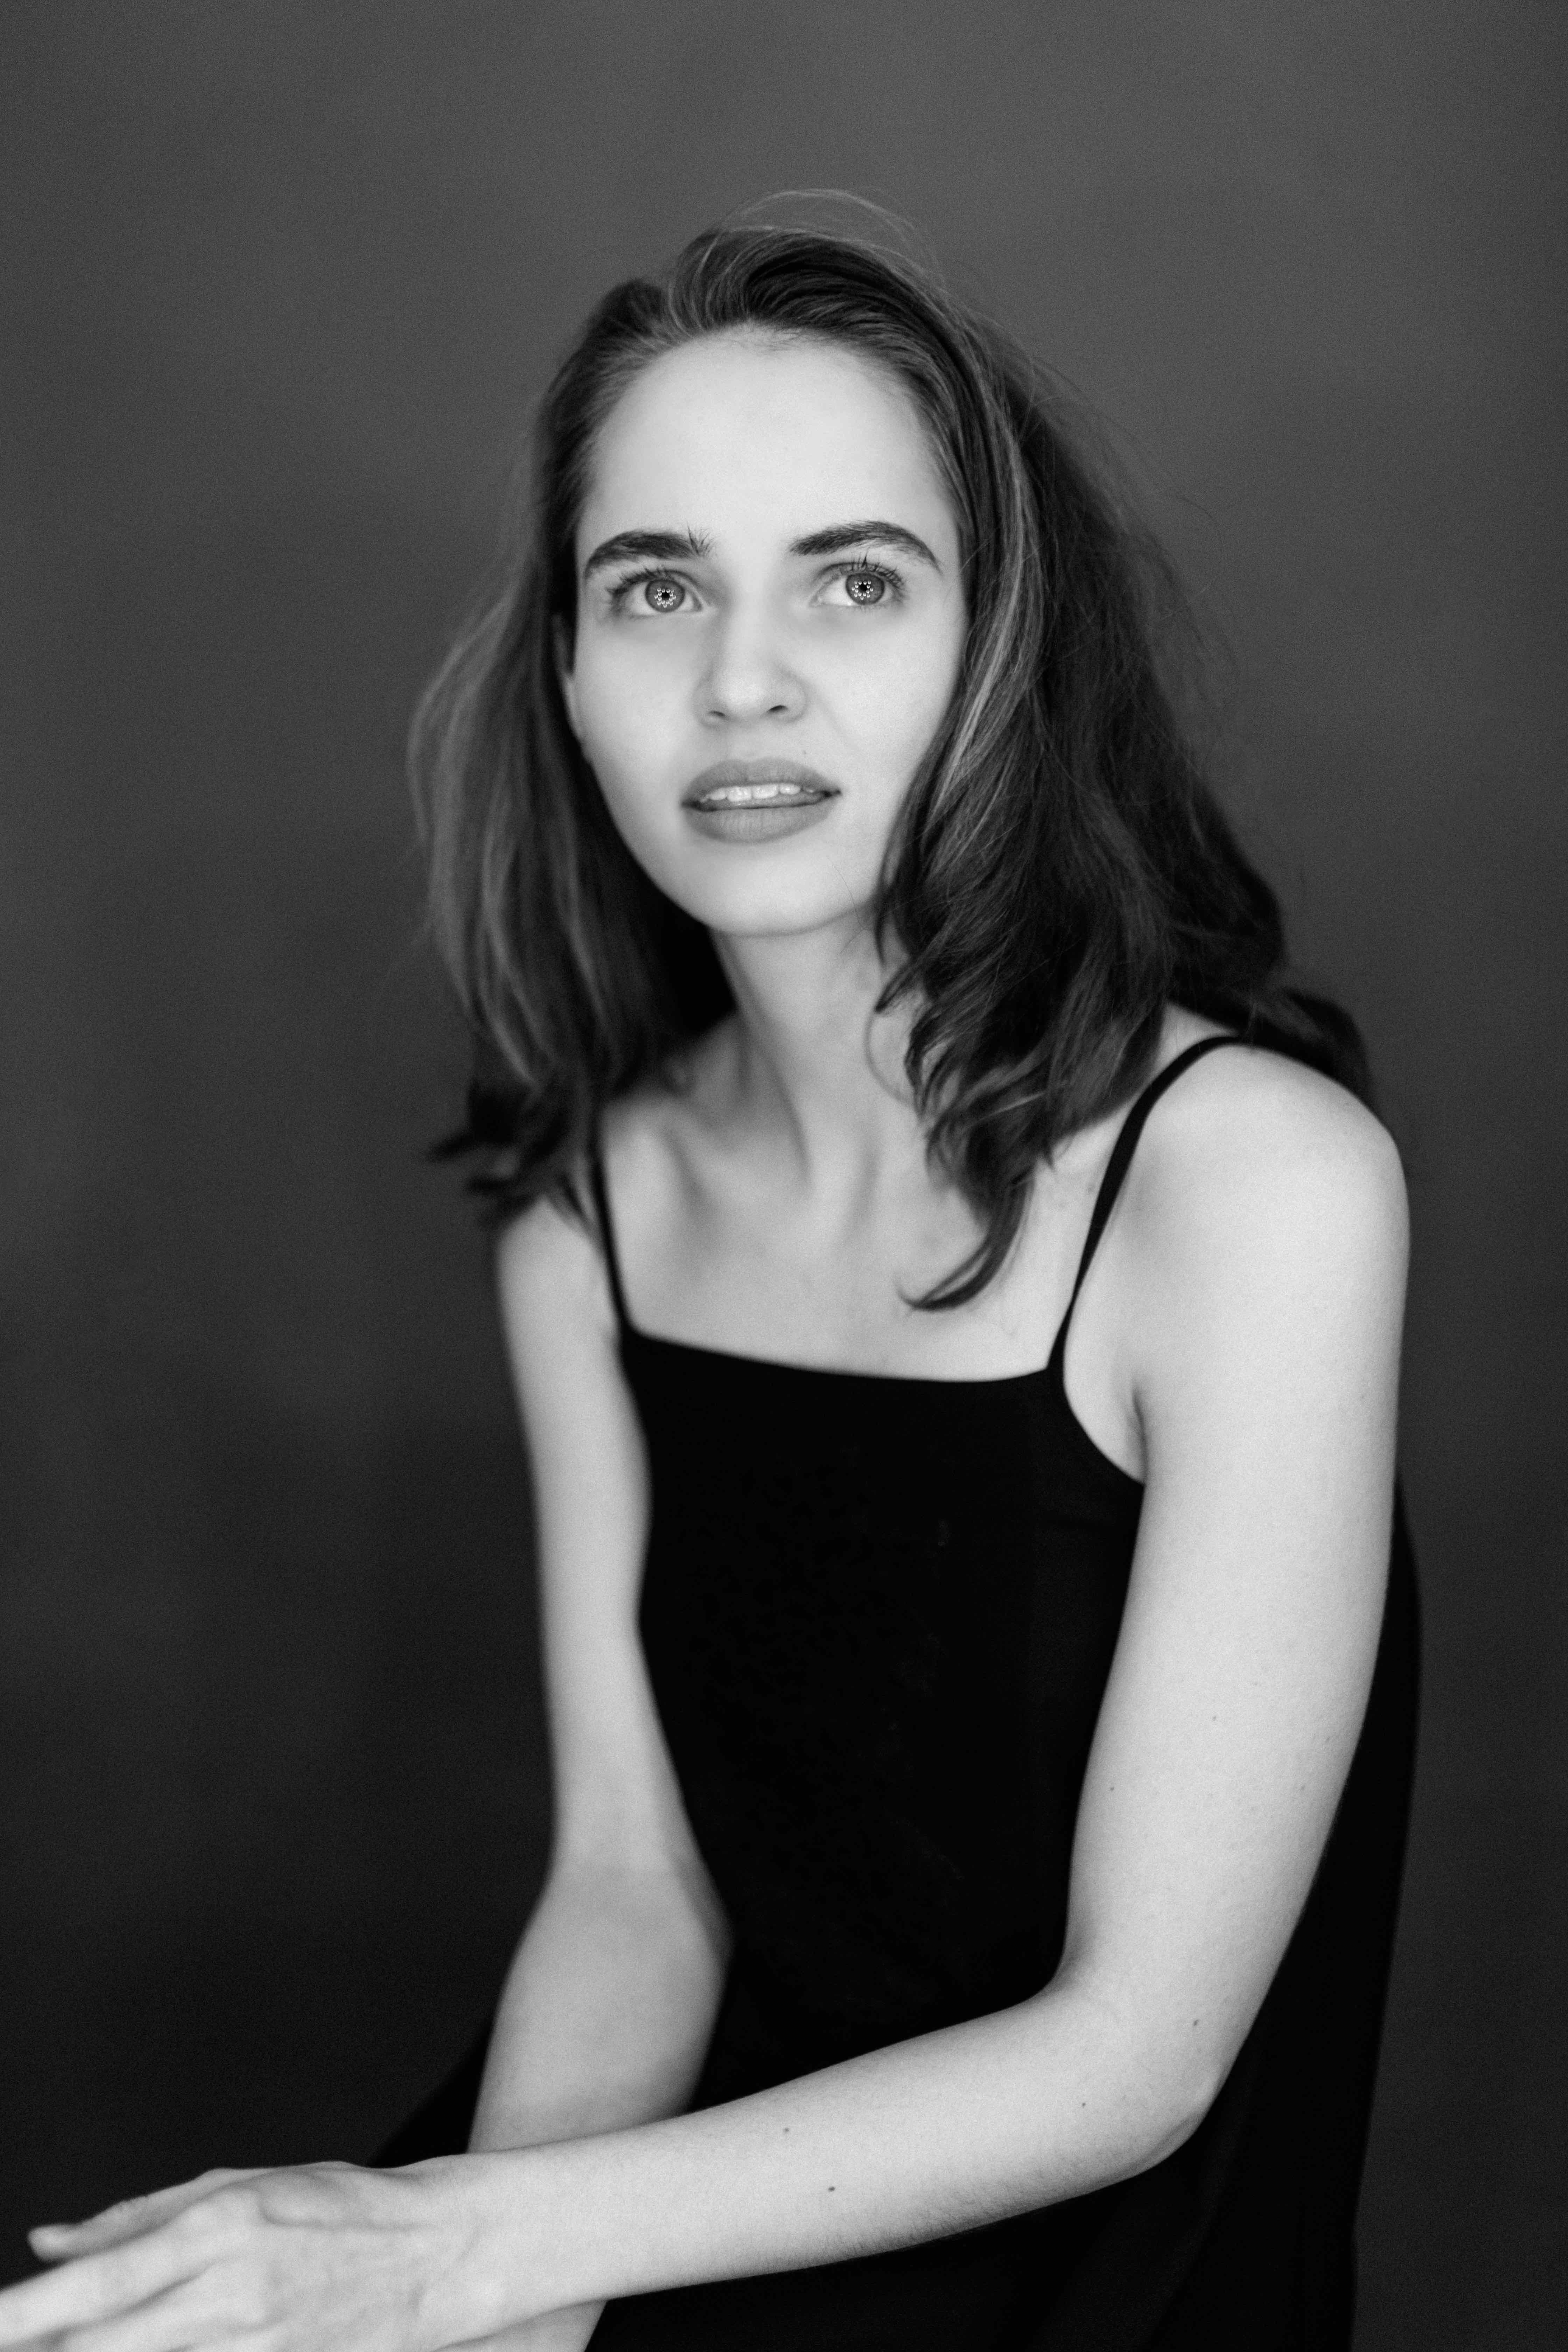 Web-Shine-Model-Beauty-Shoot-Jemima-London-02-jpg.jpg#asset:47932